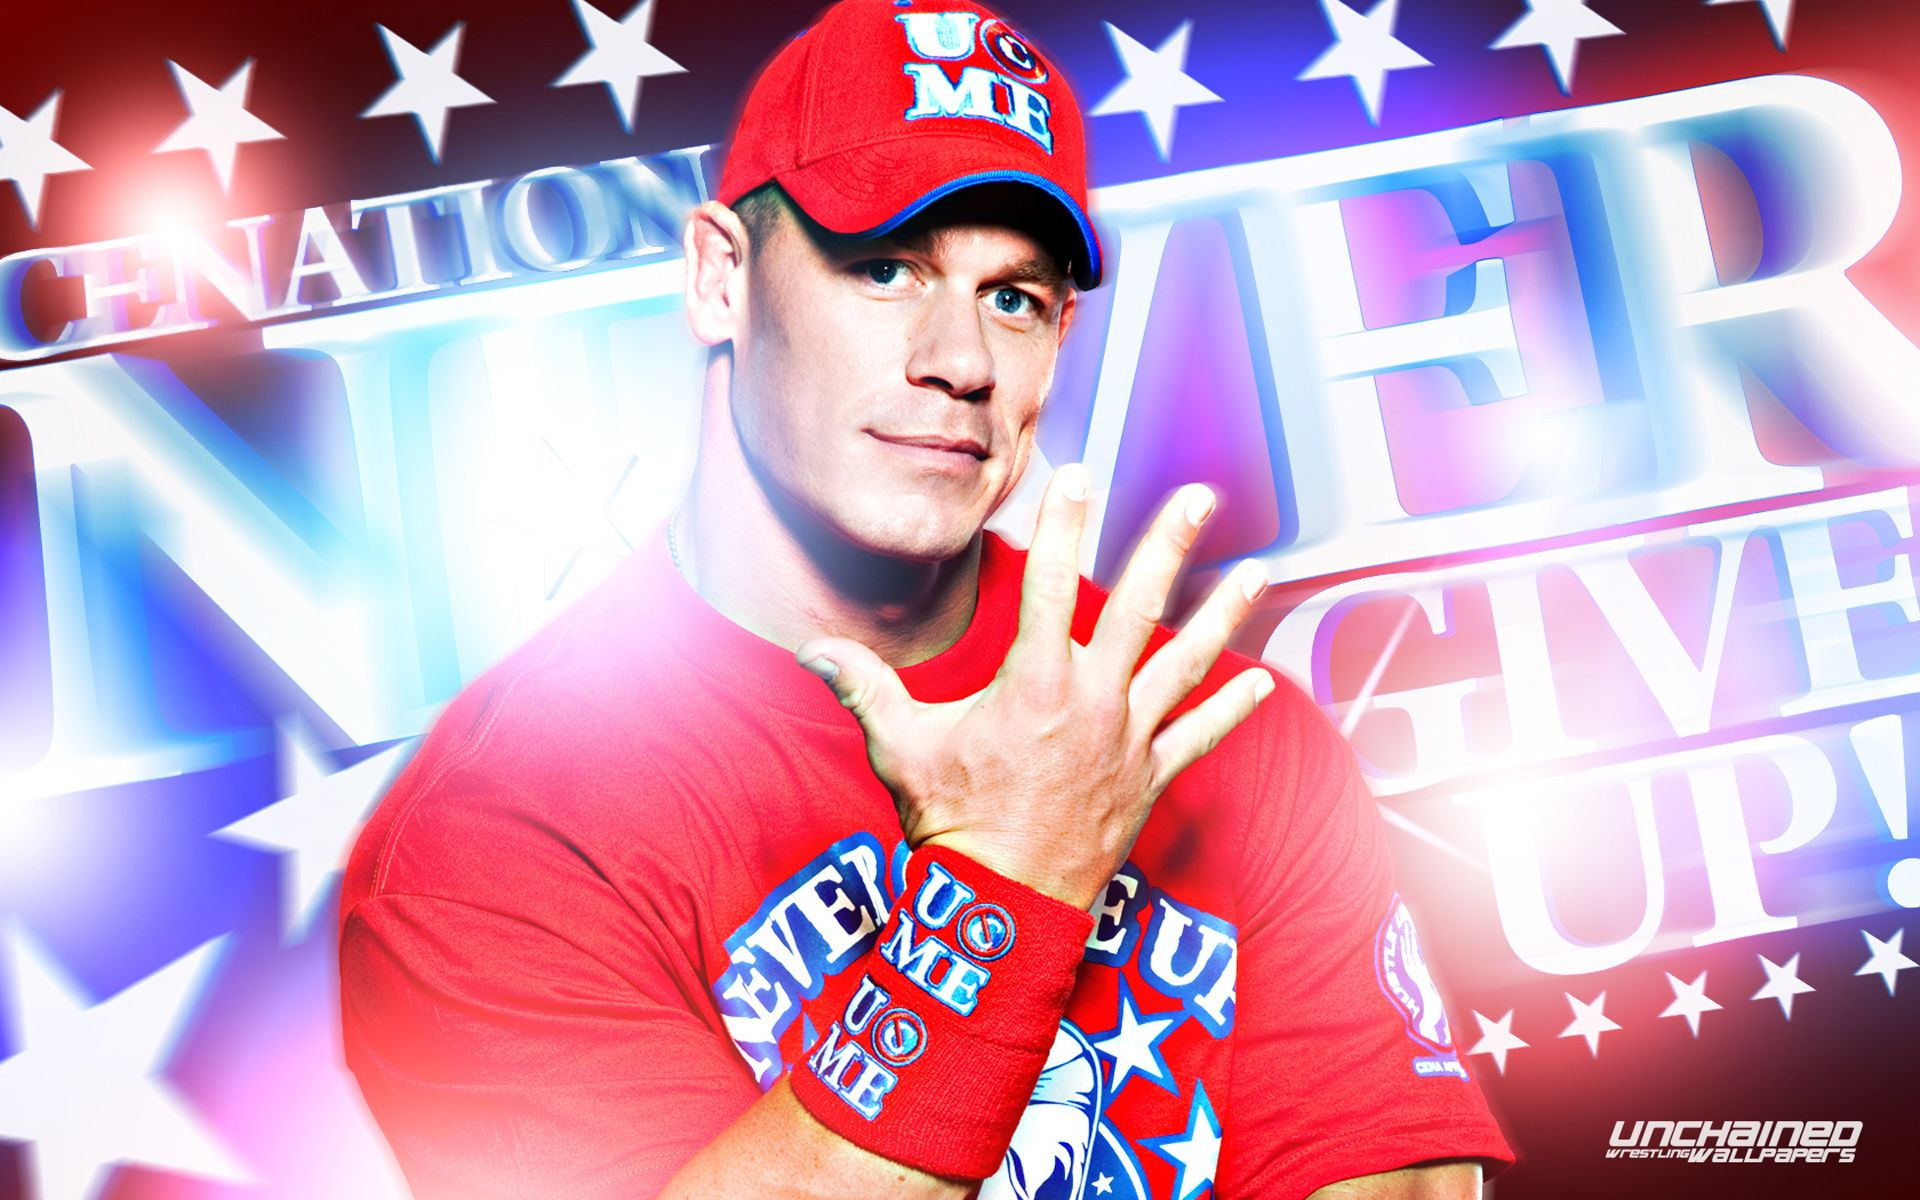 John Cena Wallpapers Cenation The Rock Vs John Cena Wrestlemania